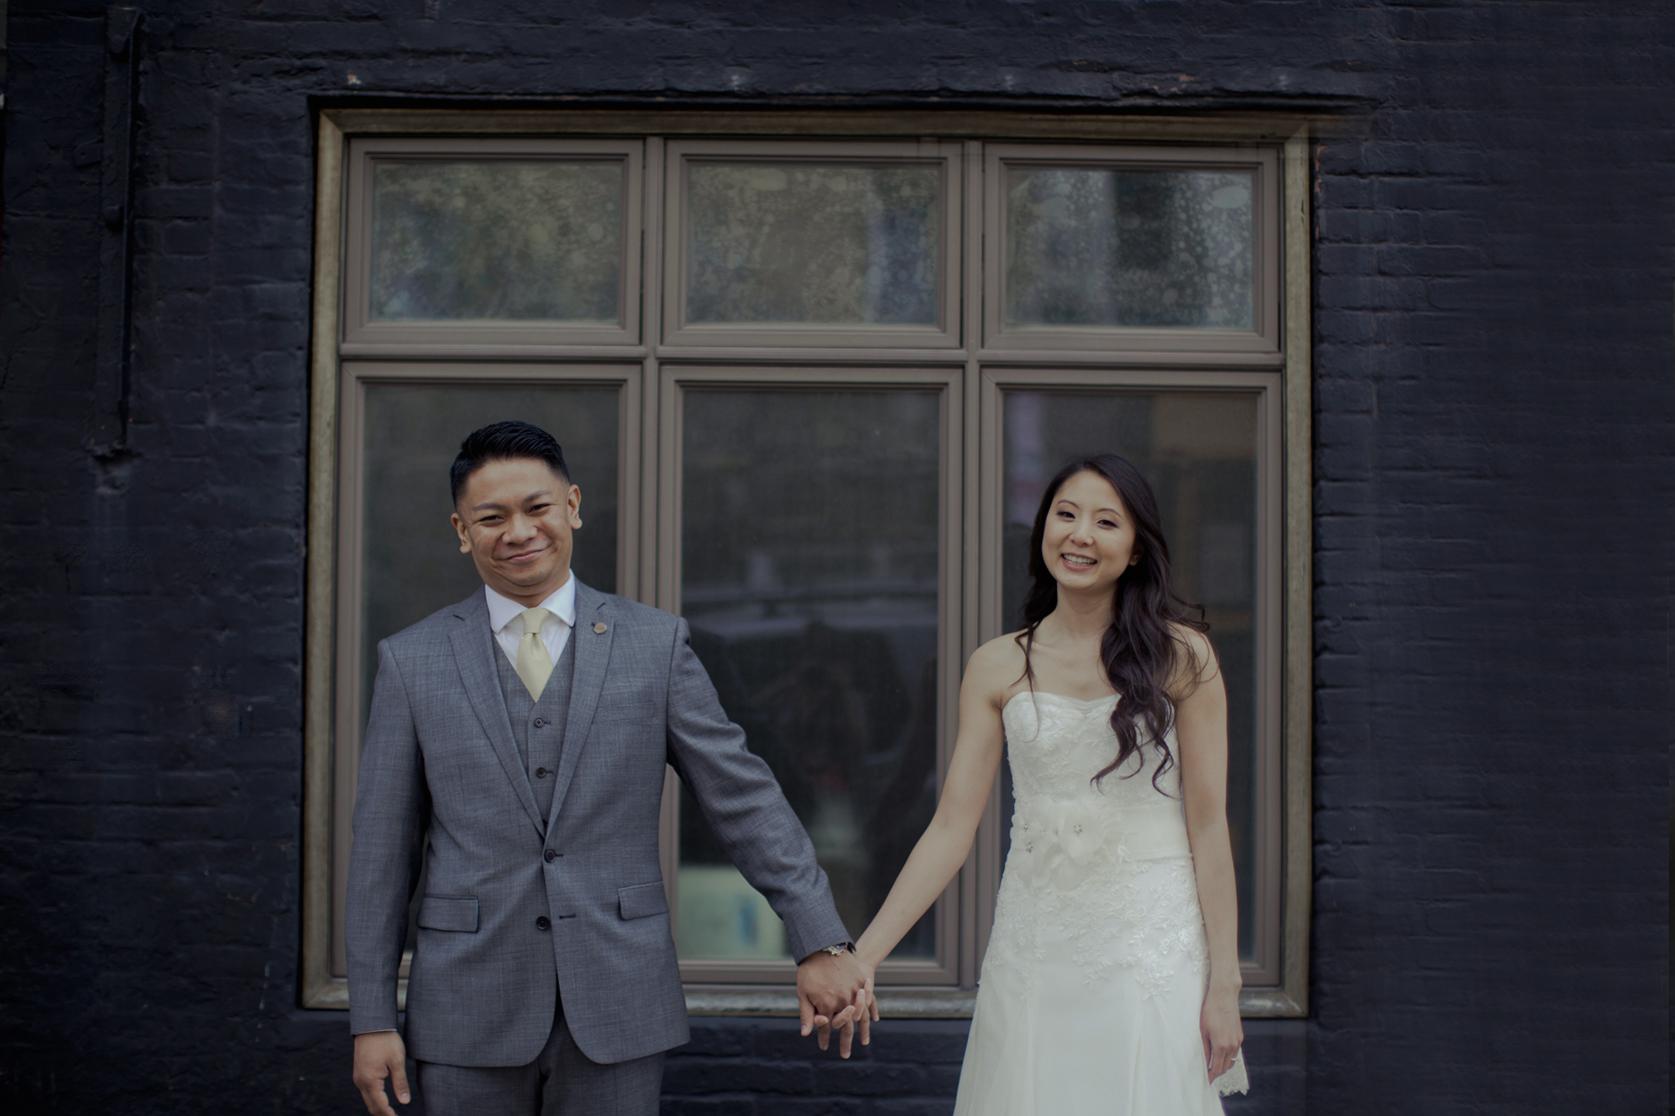 New-York-City-Wedding-Photographer_041